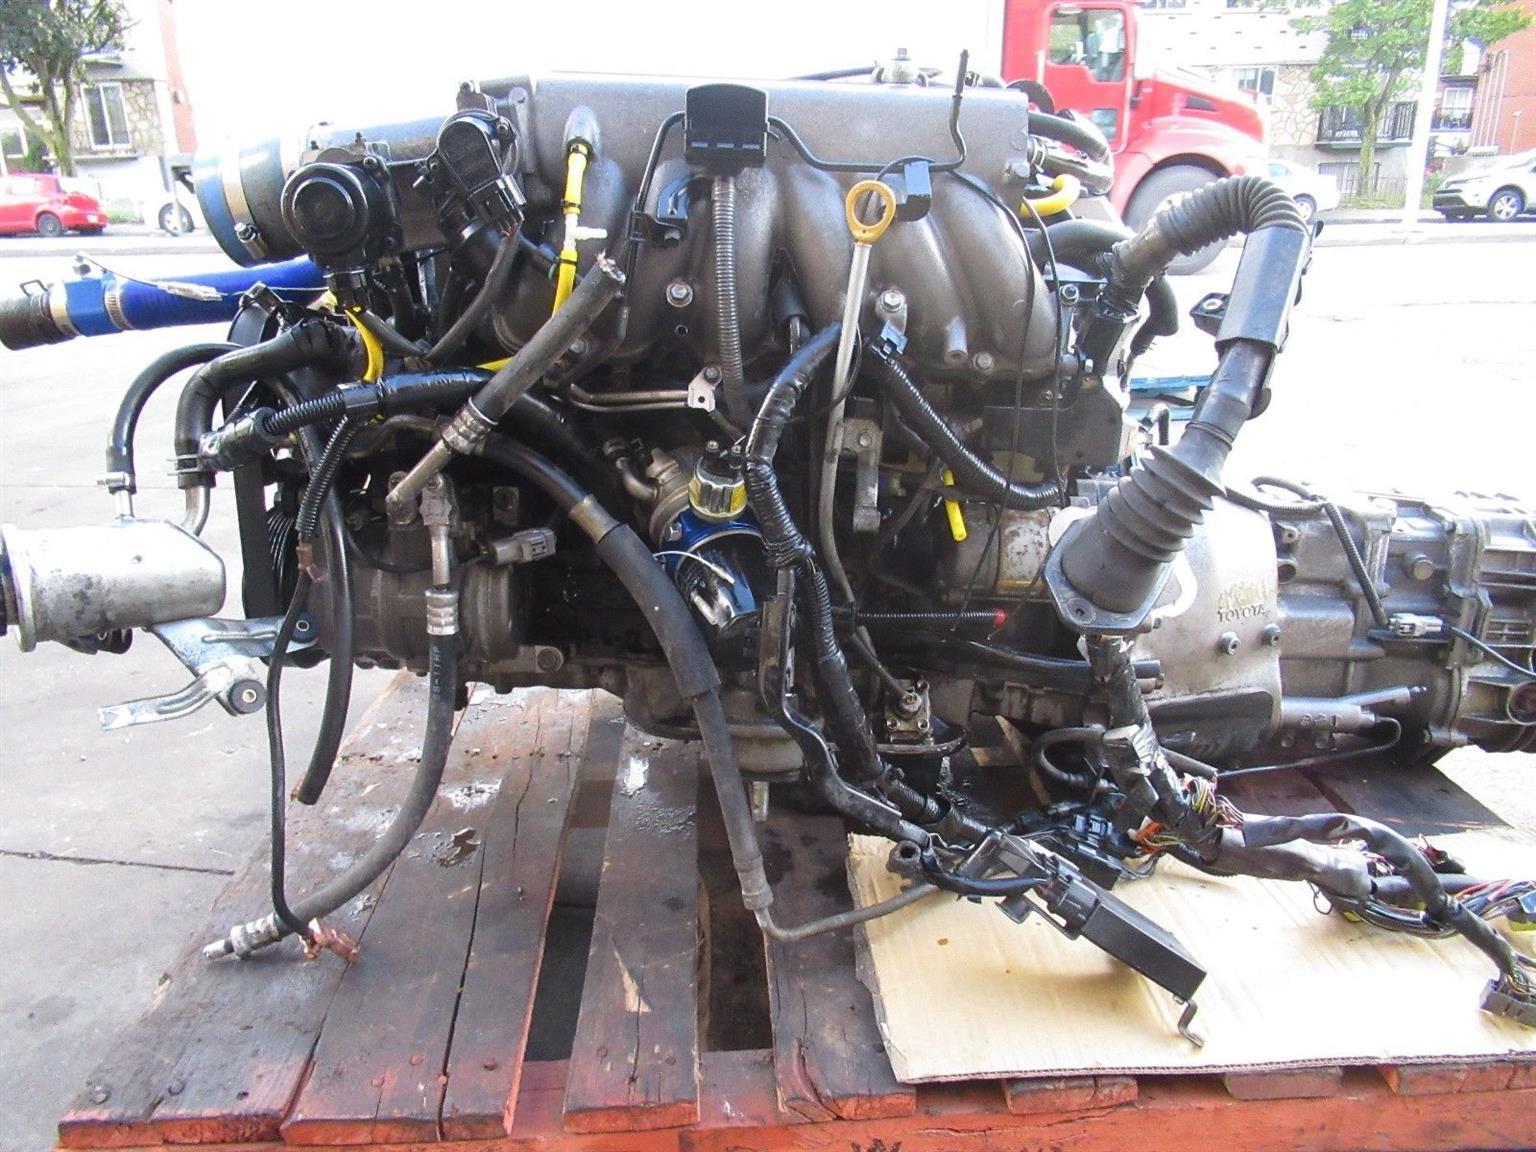 Jdm Toyota Supra 2jz Gte Twin Turbo Engine 6 Speed V161 Getrag Transmission Wiring Harness Auto